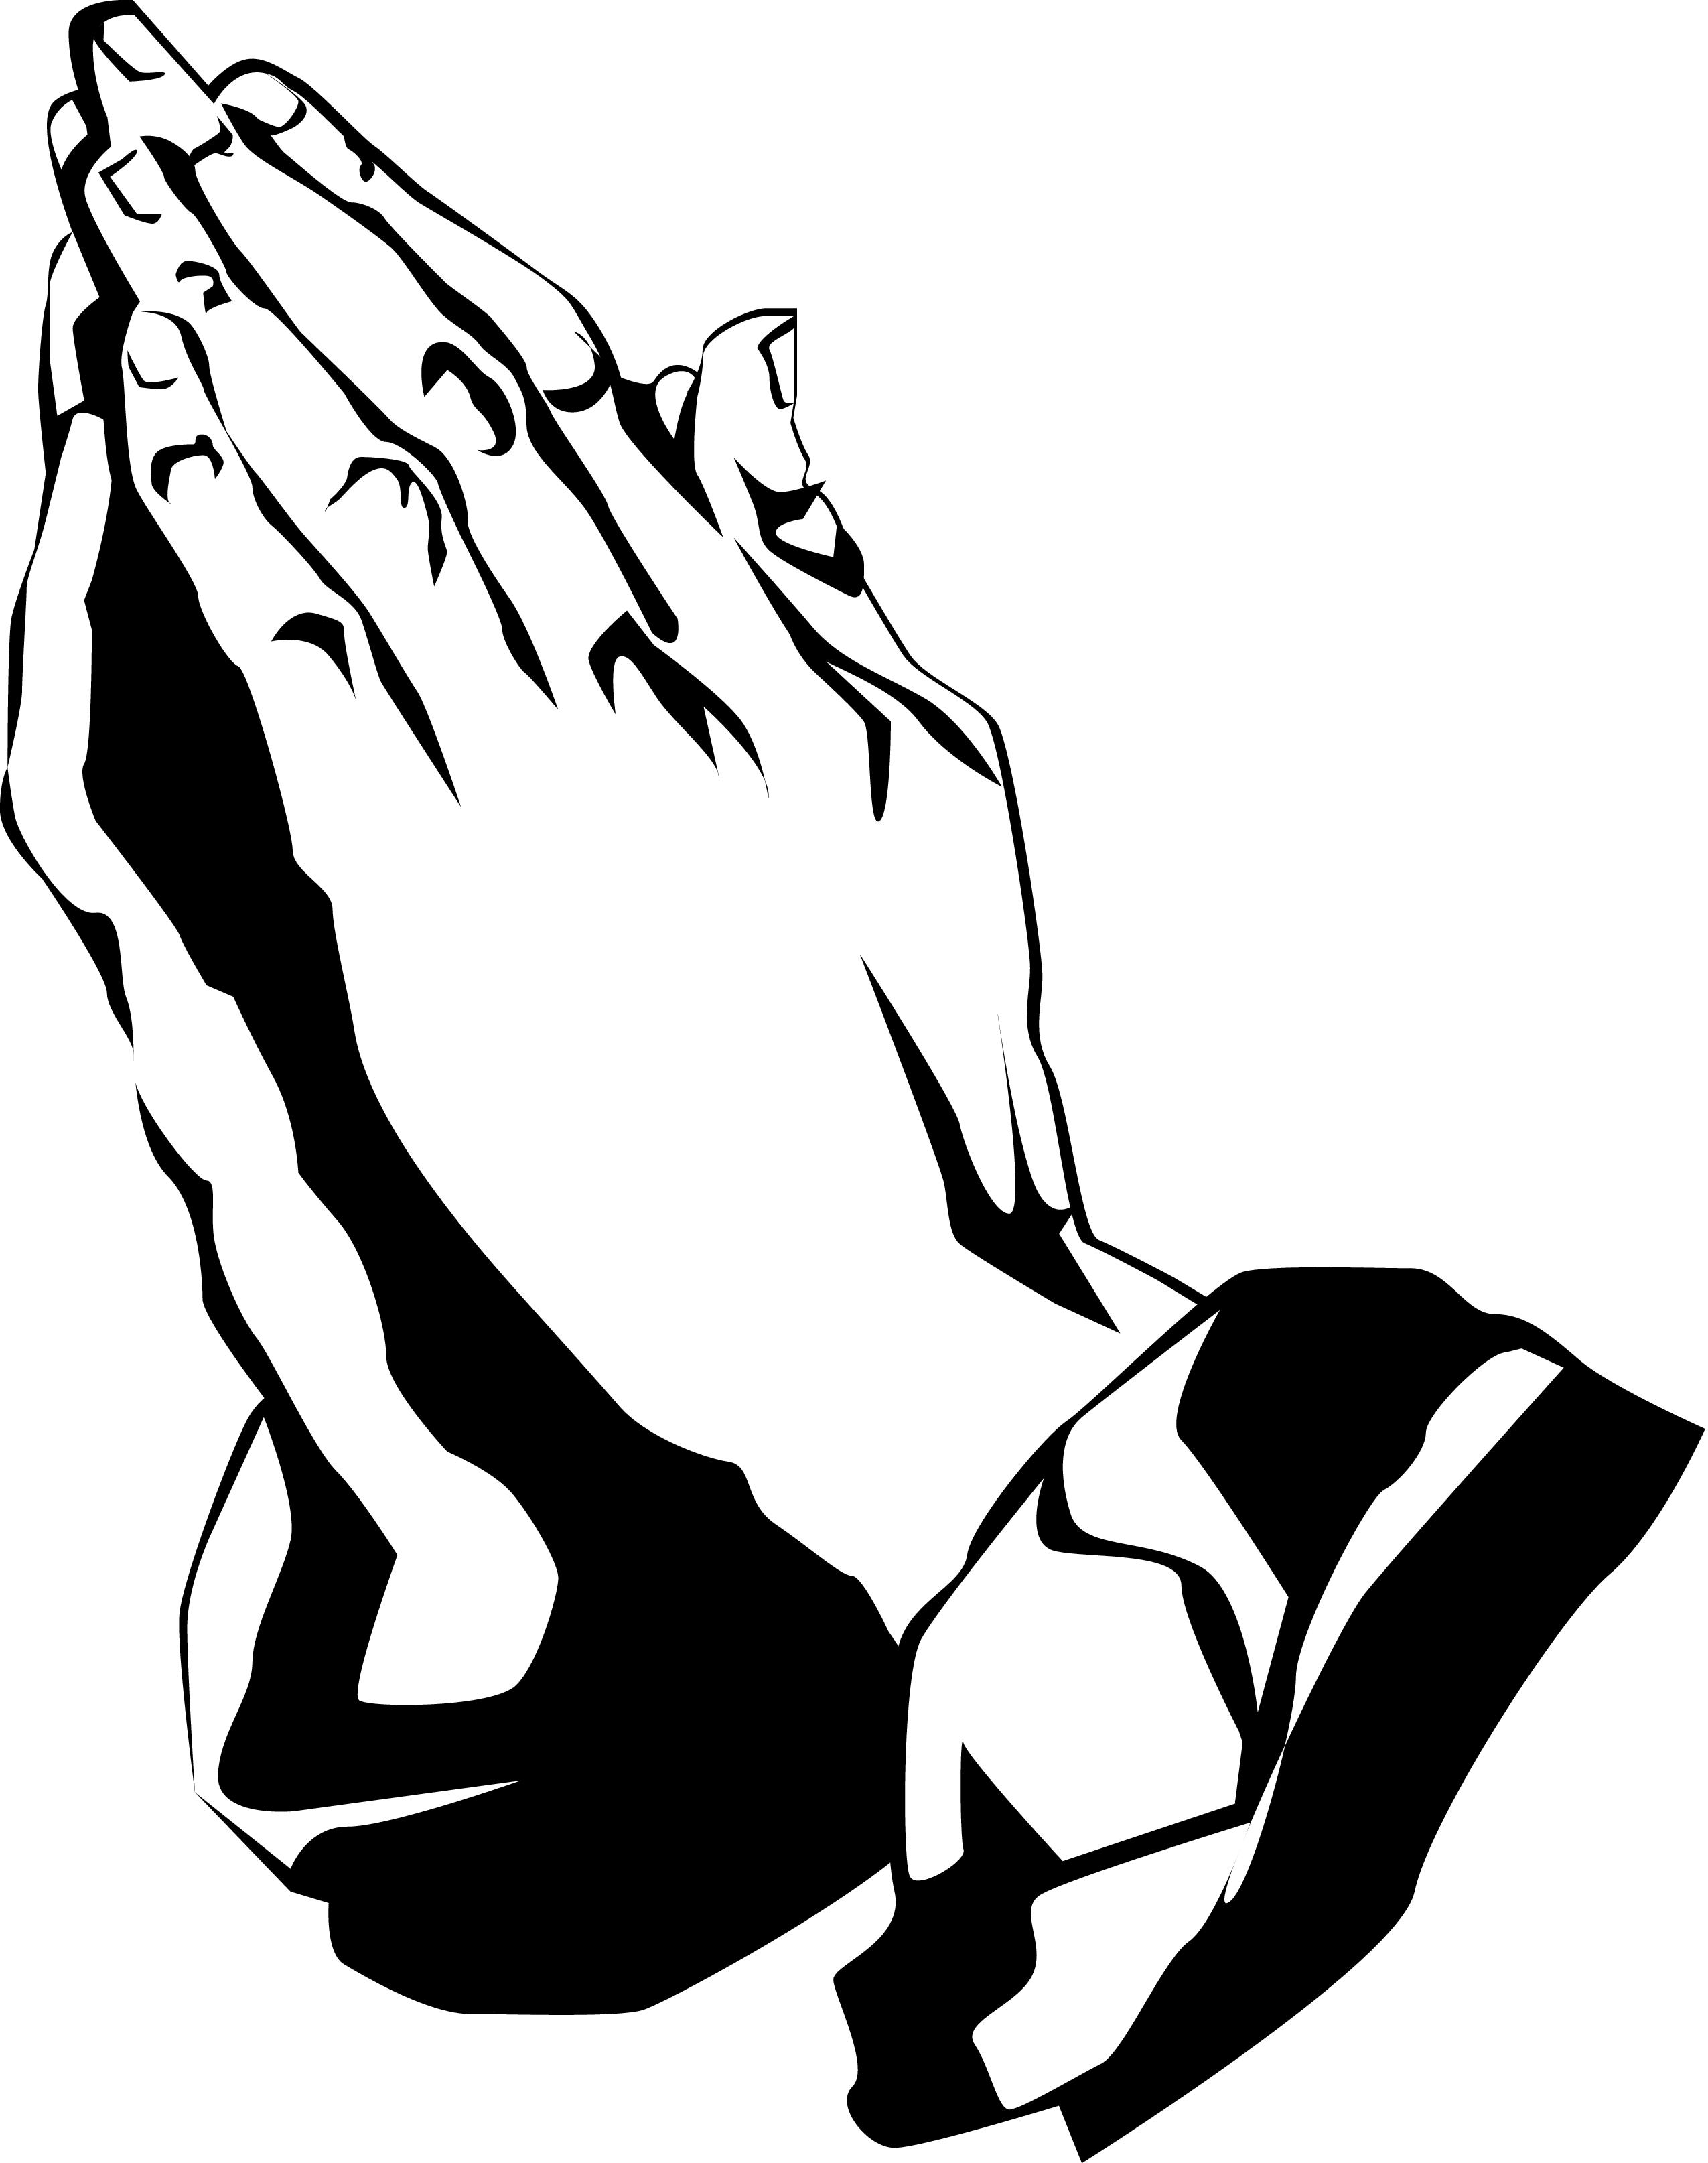 Church praying wikiclipart . Hands clipart amen